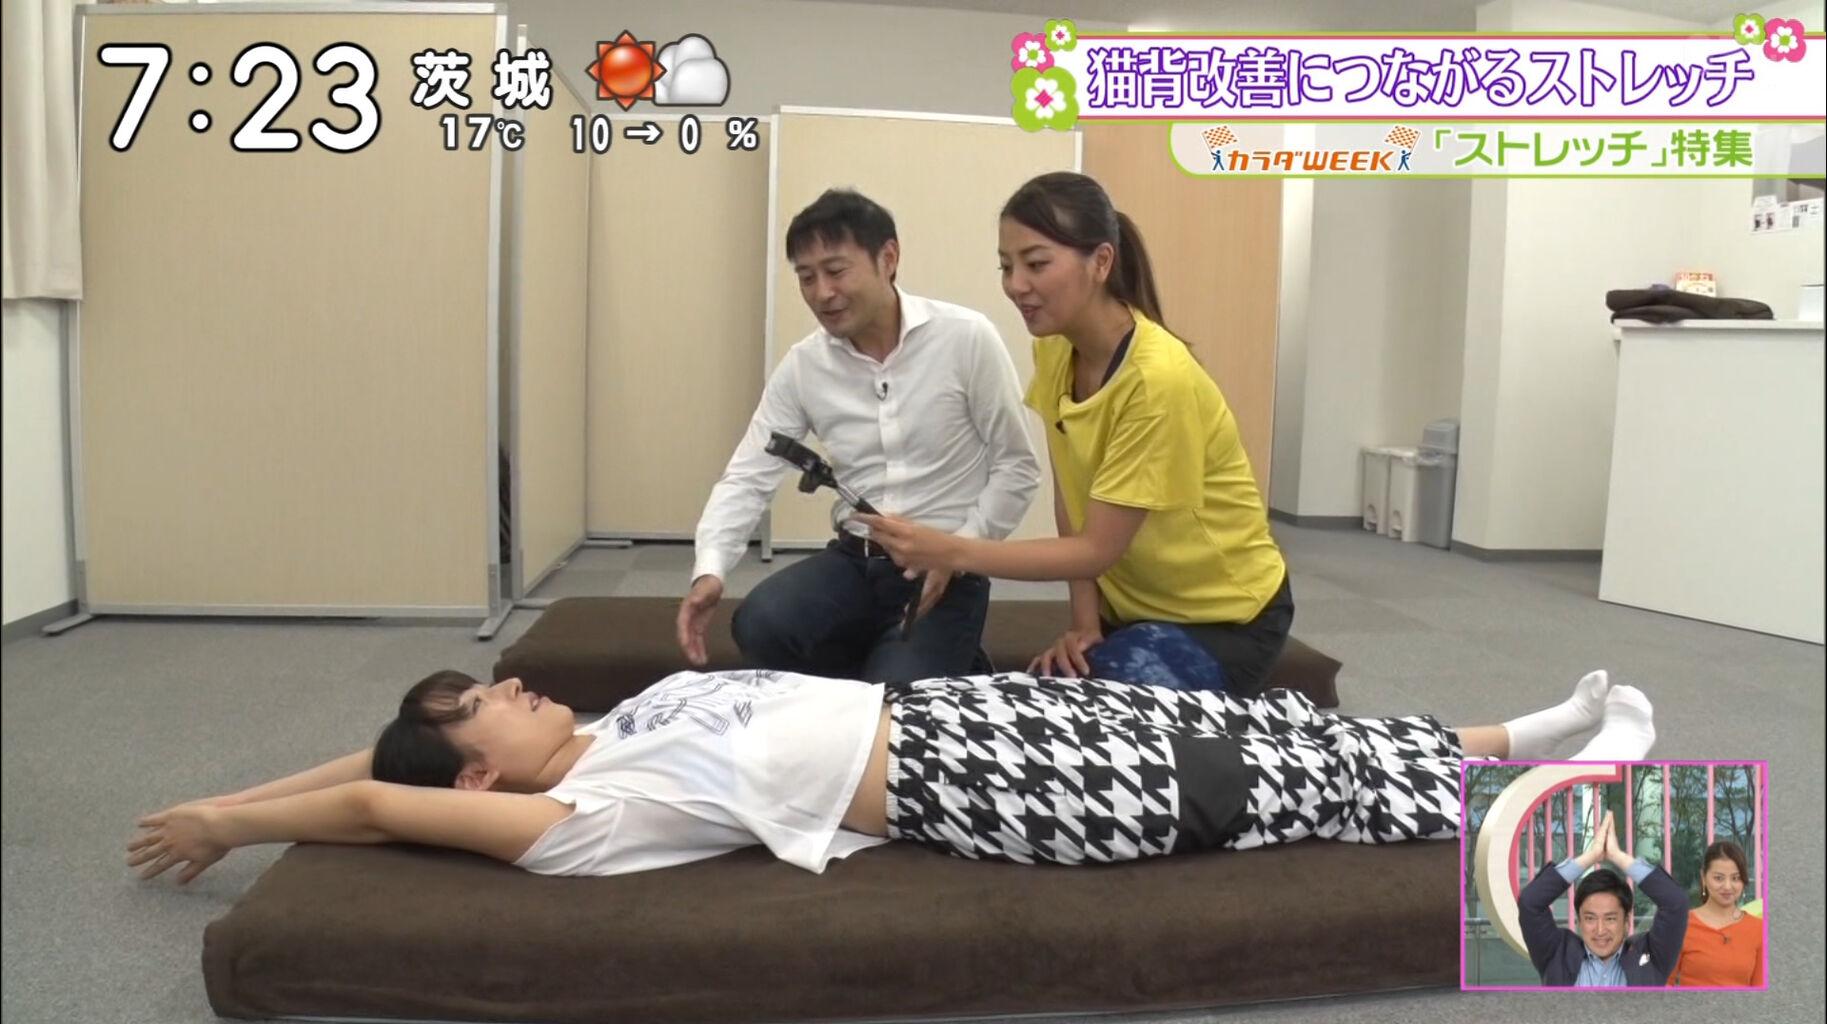 https://livedoor.blogimg.jp/himahiki/imgs/4/8/486ce293.jpg